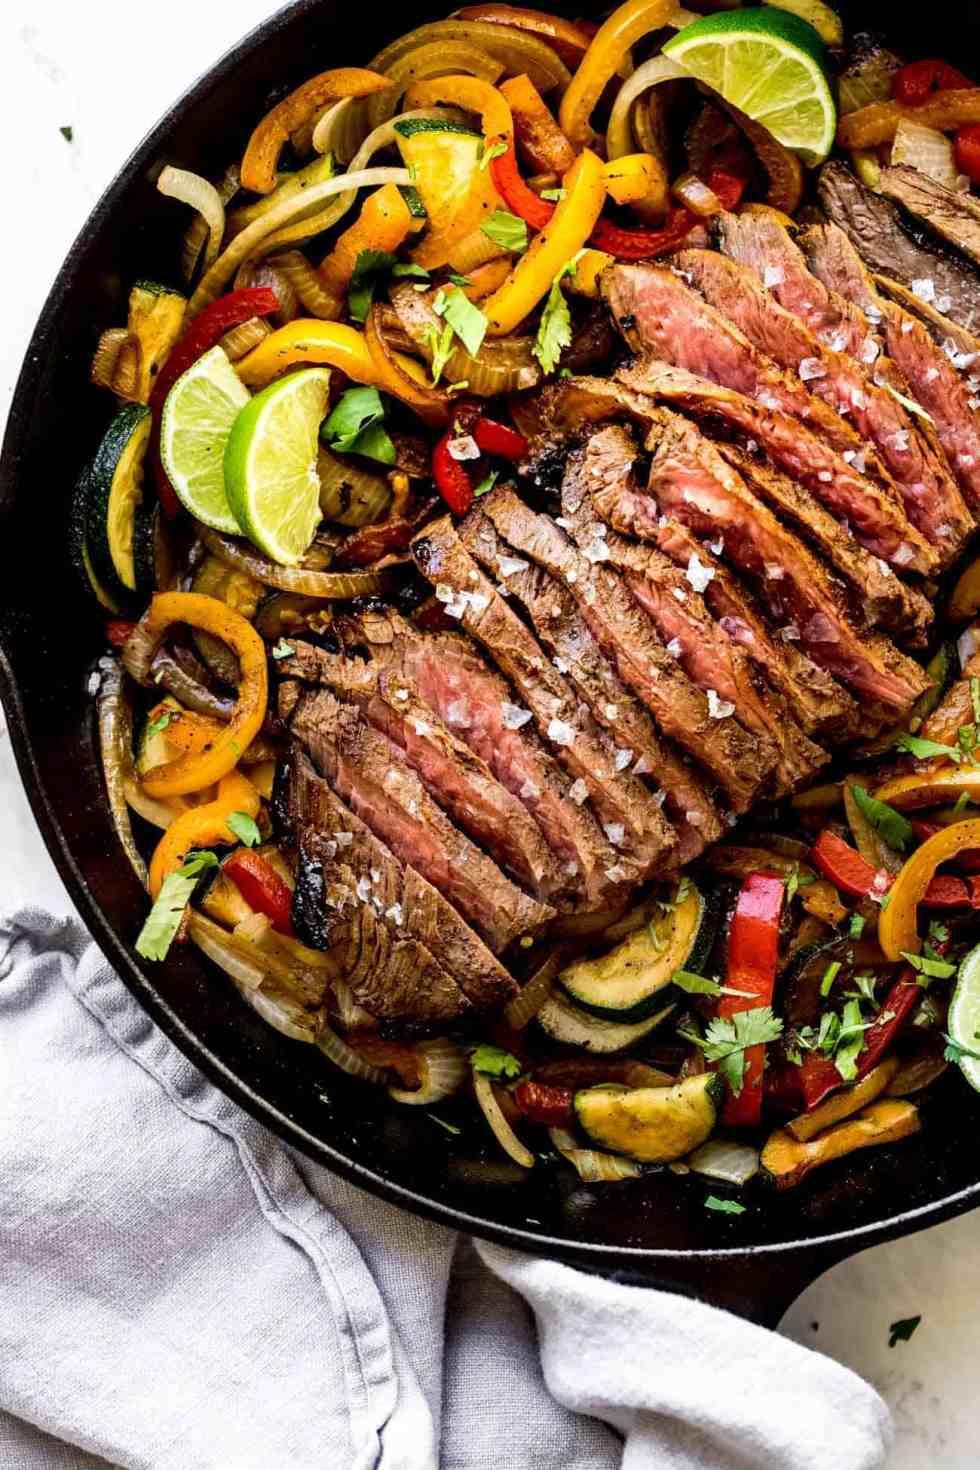 steak fajitas in a cast iron pan